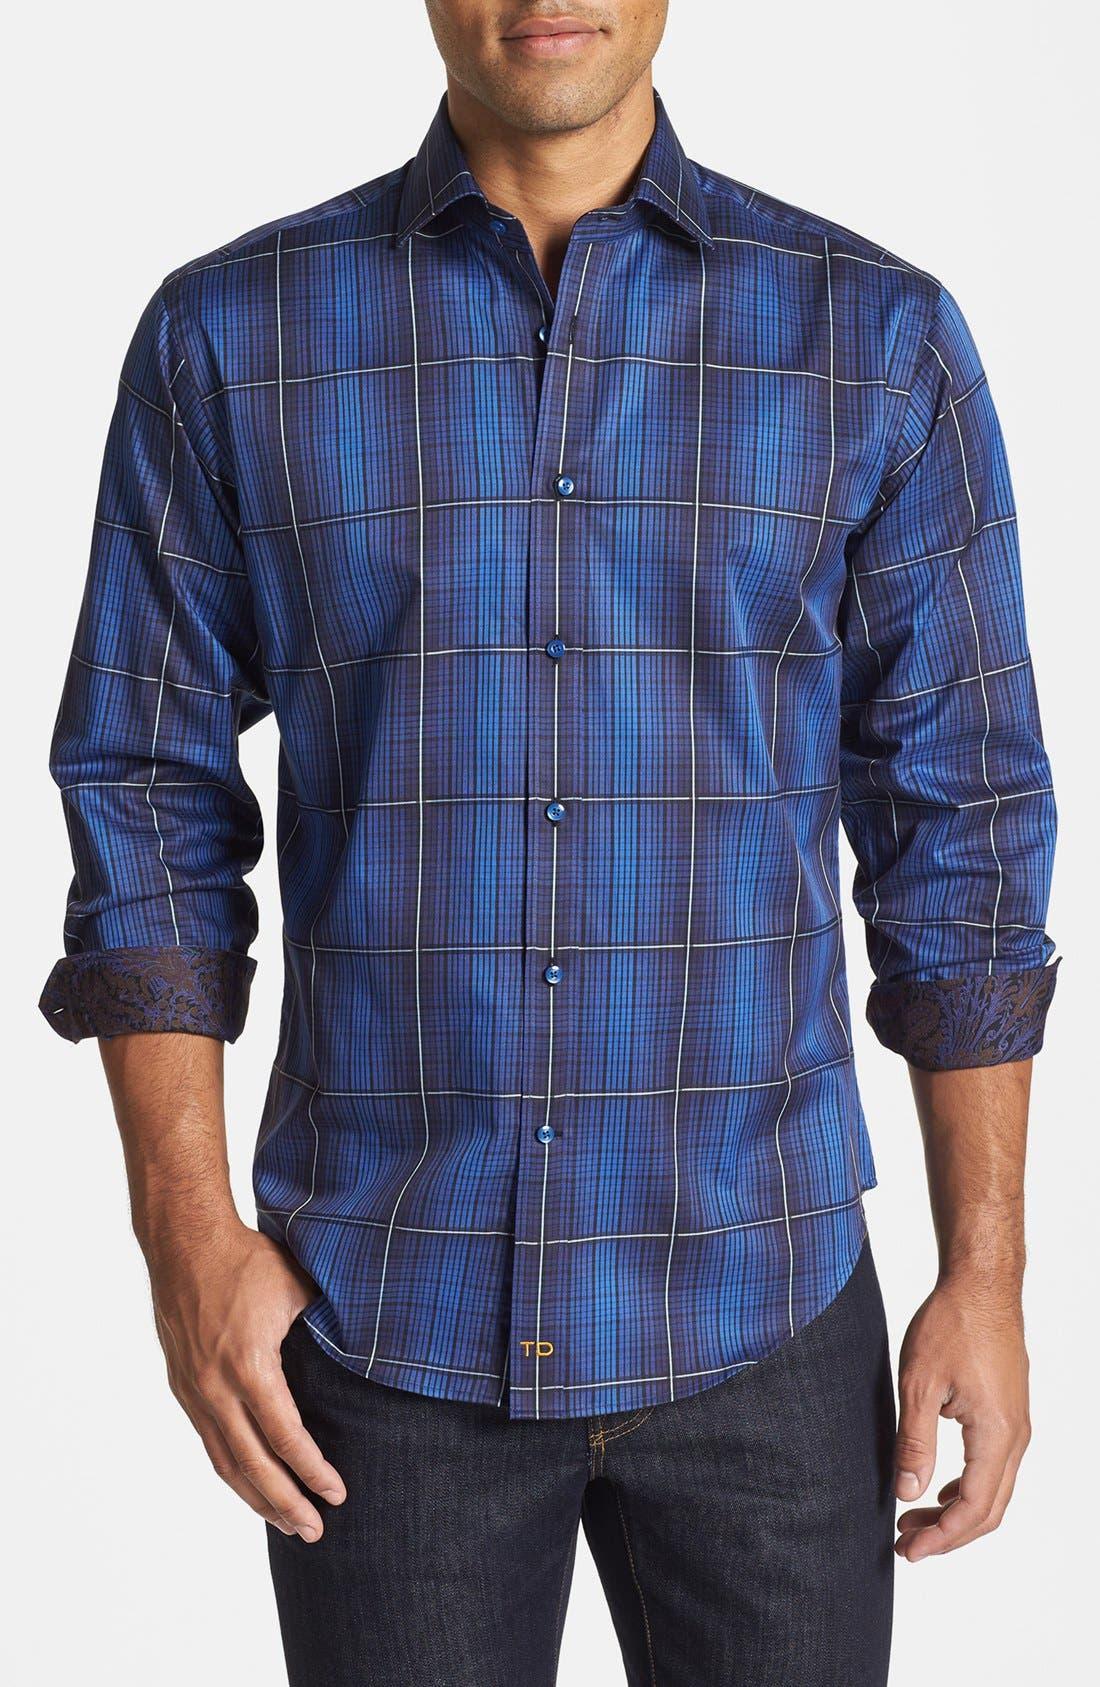 Alternate Image 1 Selected - Thomas Dean Regular Fit Check Twill Sport Shirt